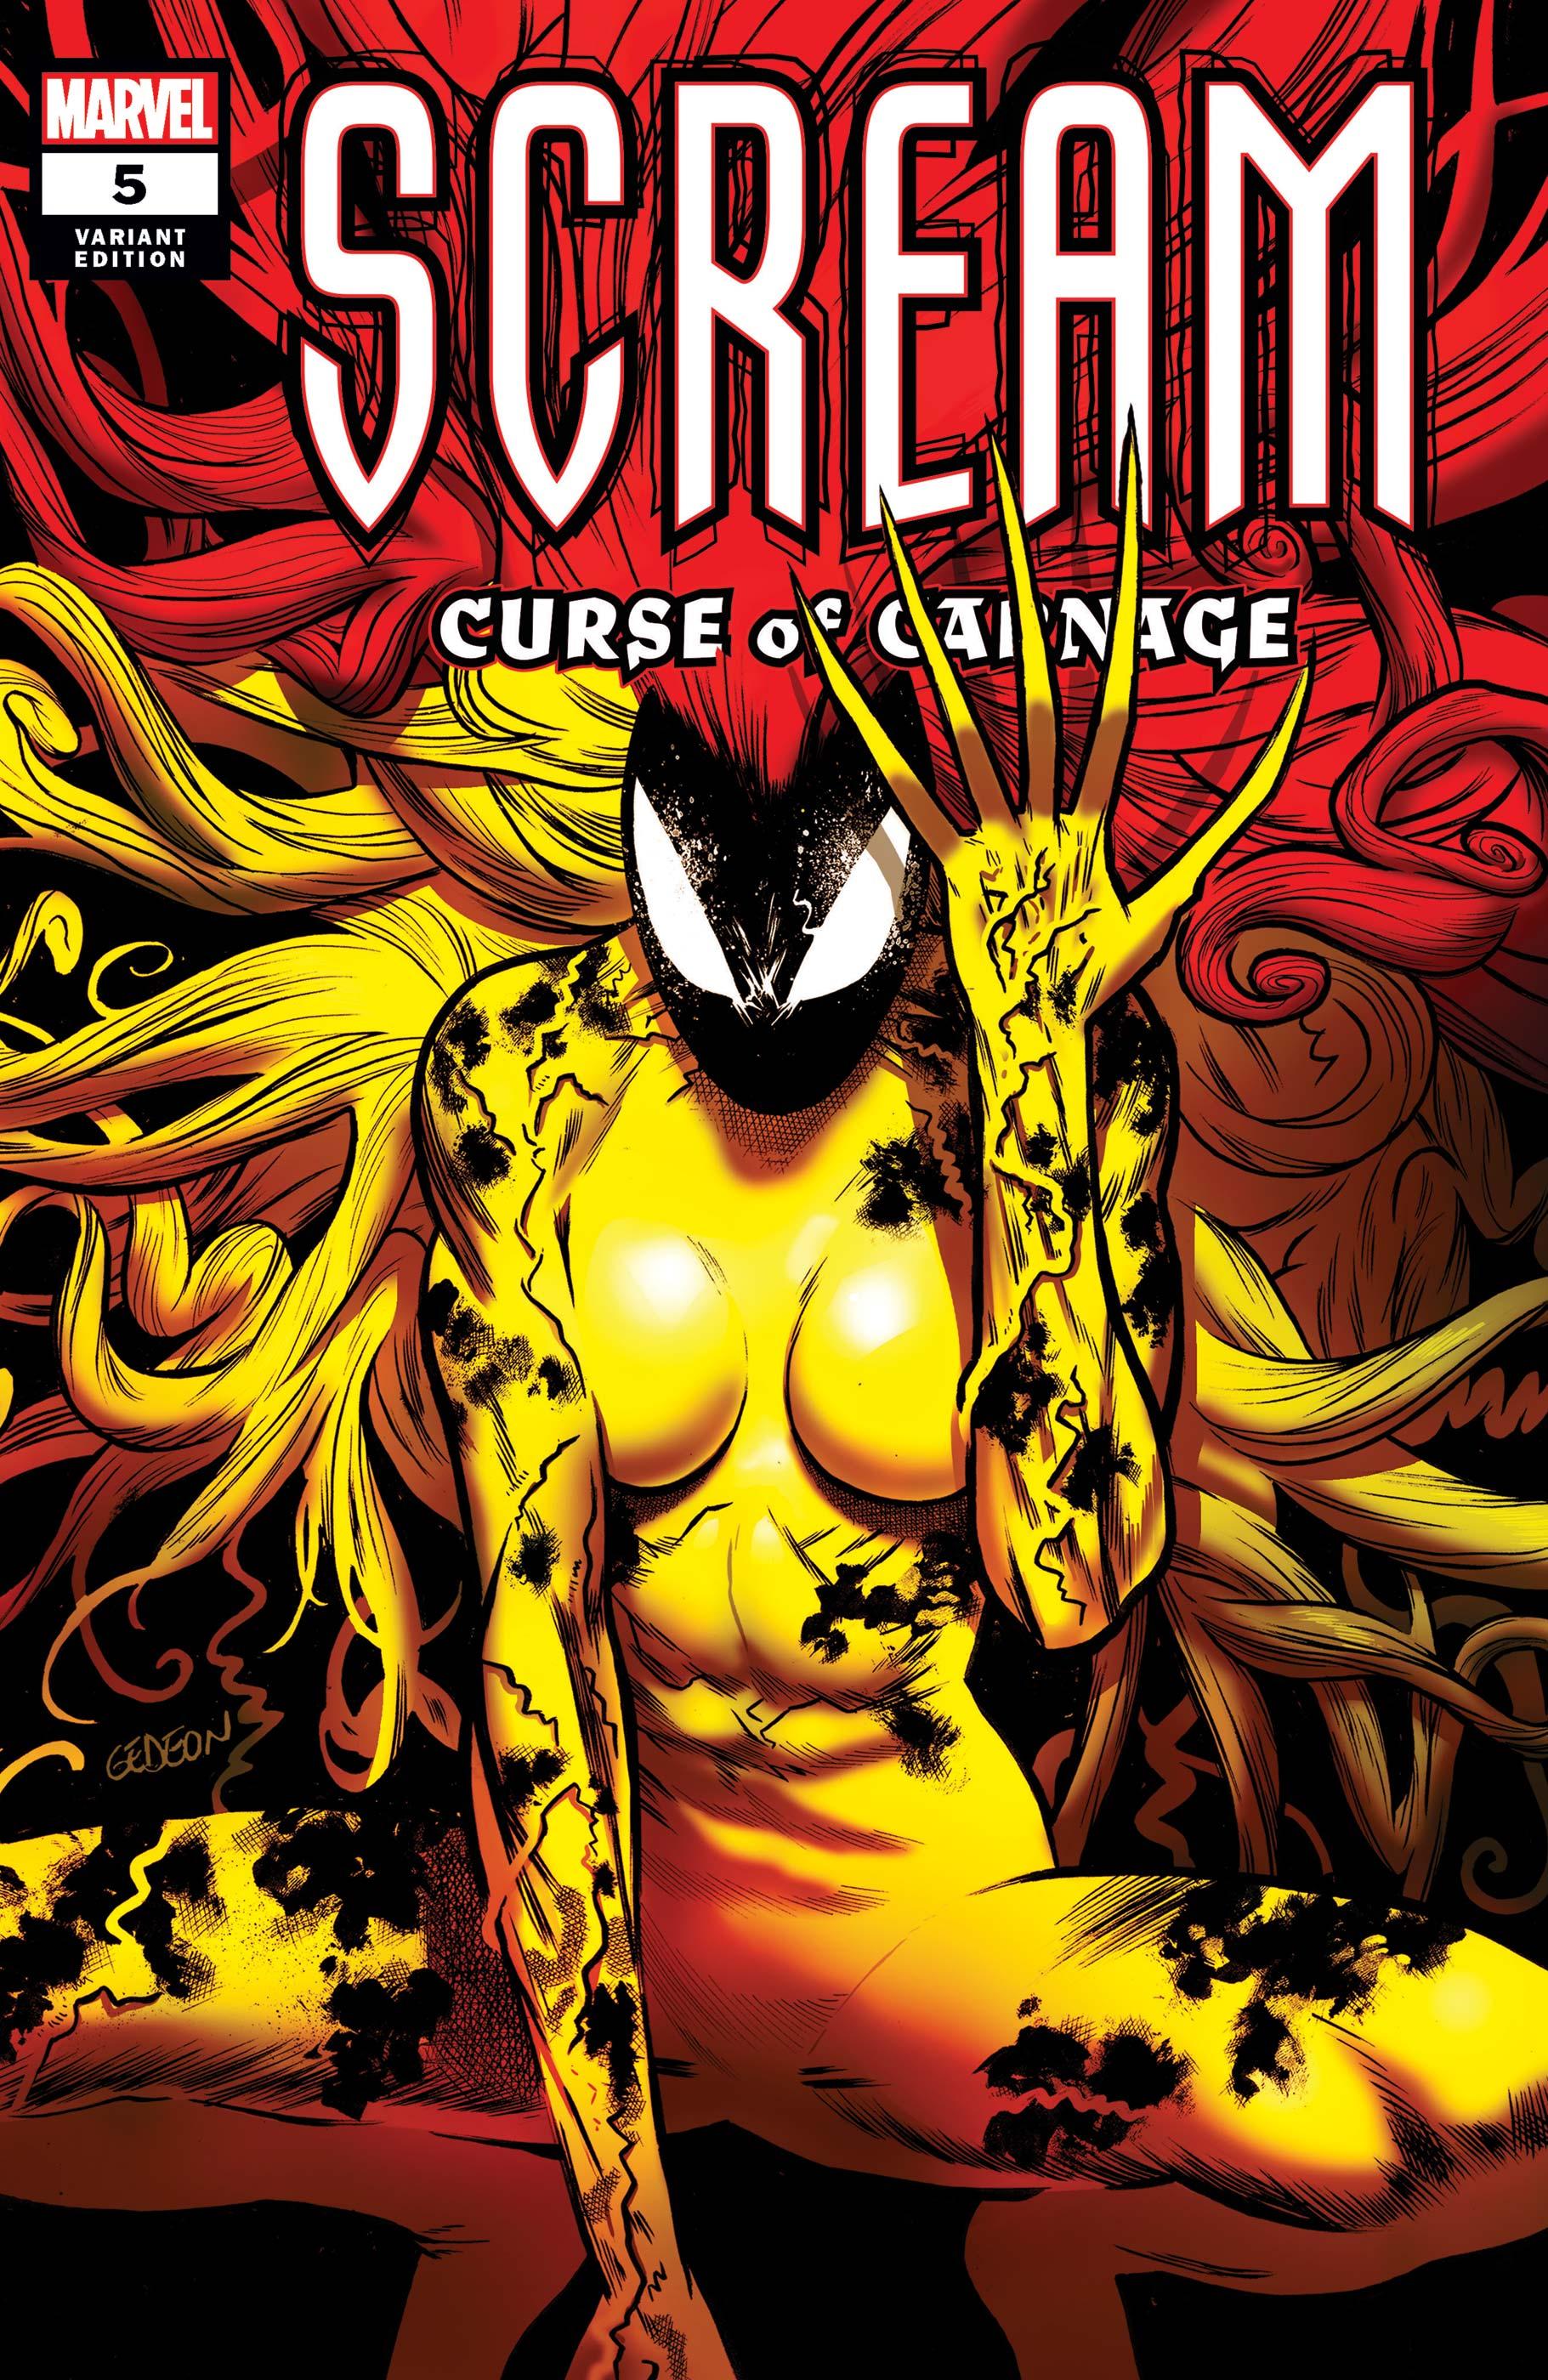 Scream: Curse of Carnage (2019) #5 (Variant)